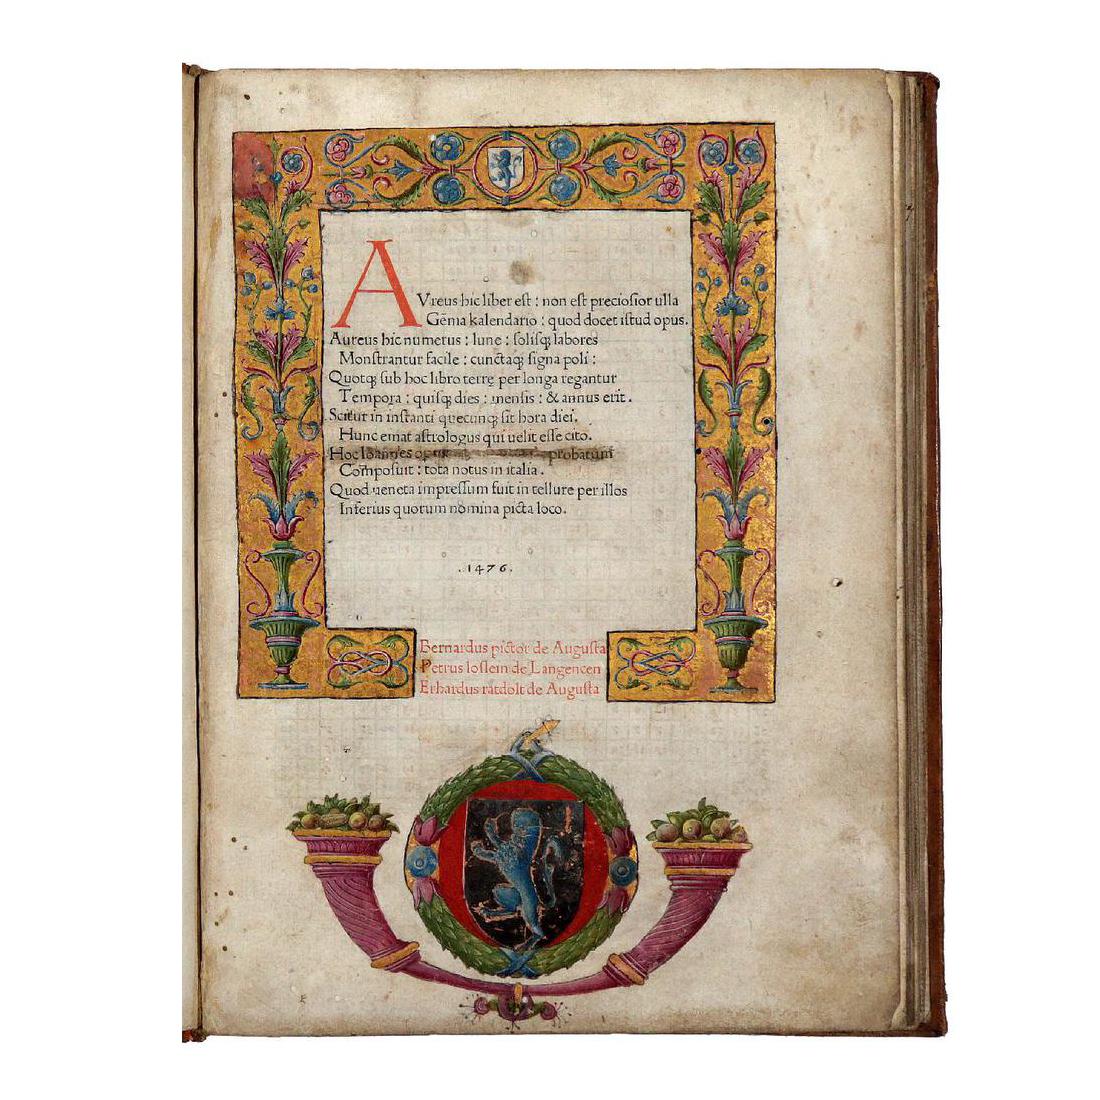 Regiomontanus title page - cropped.jpg